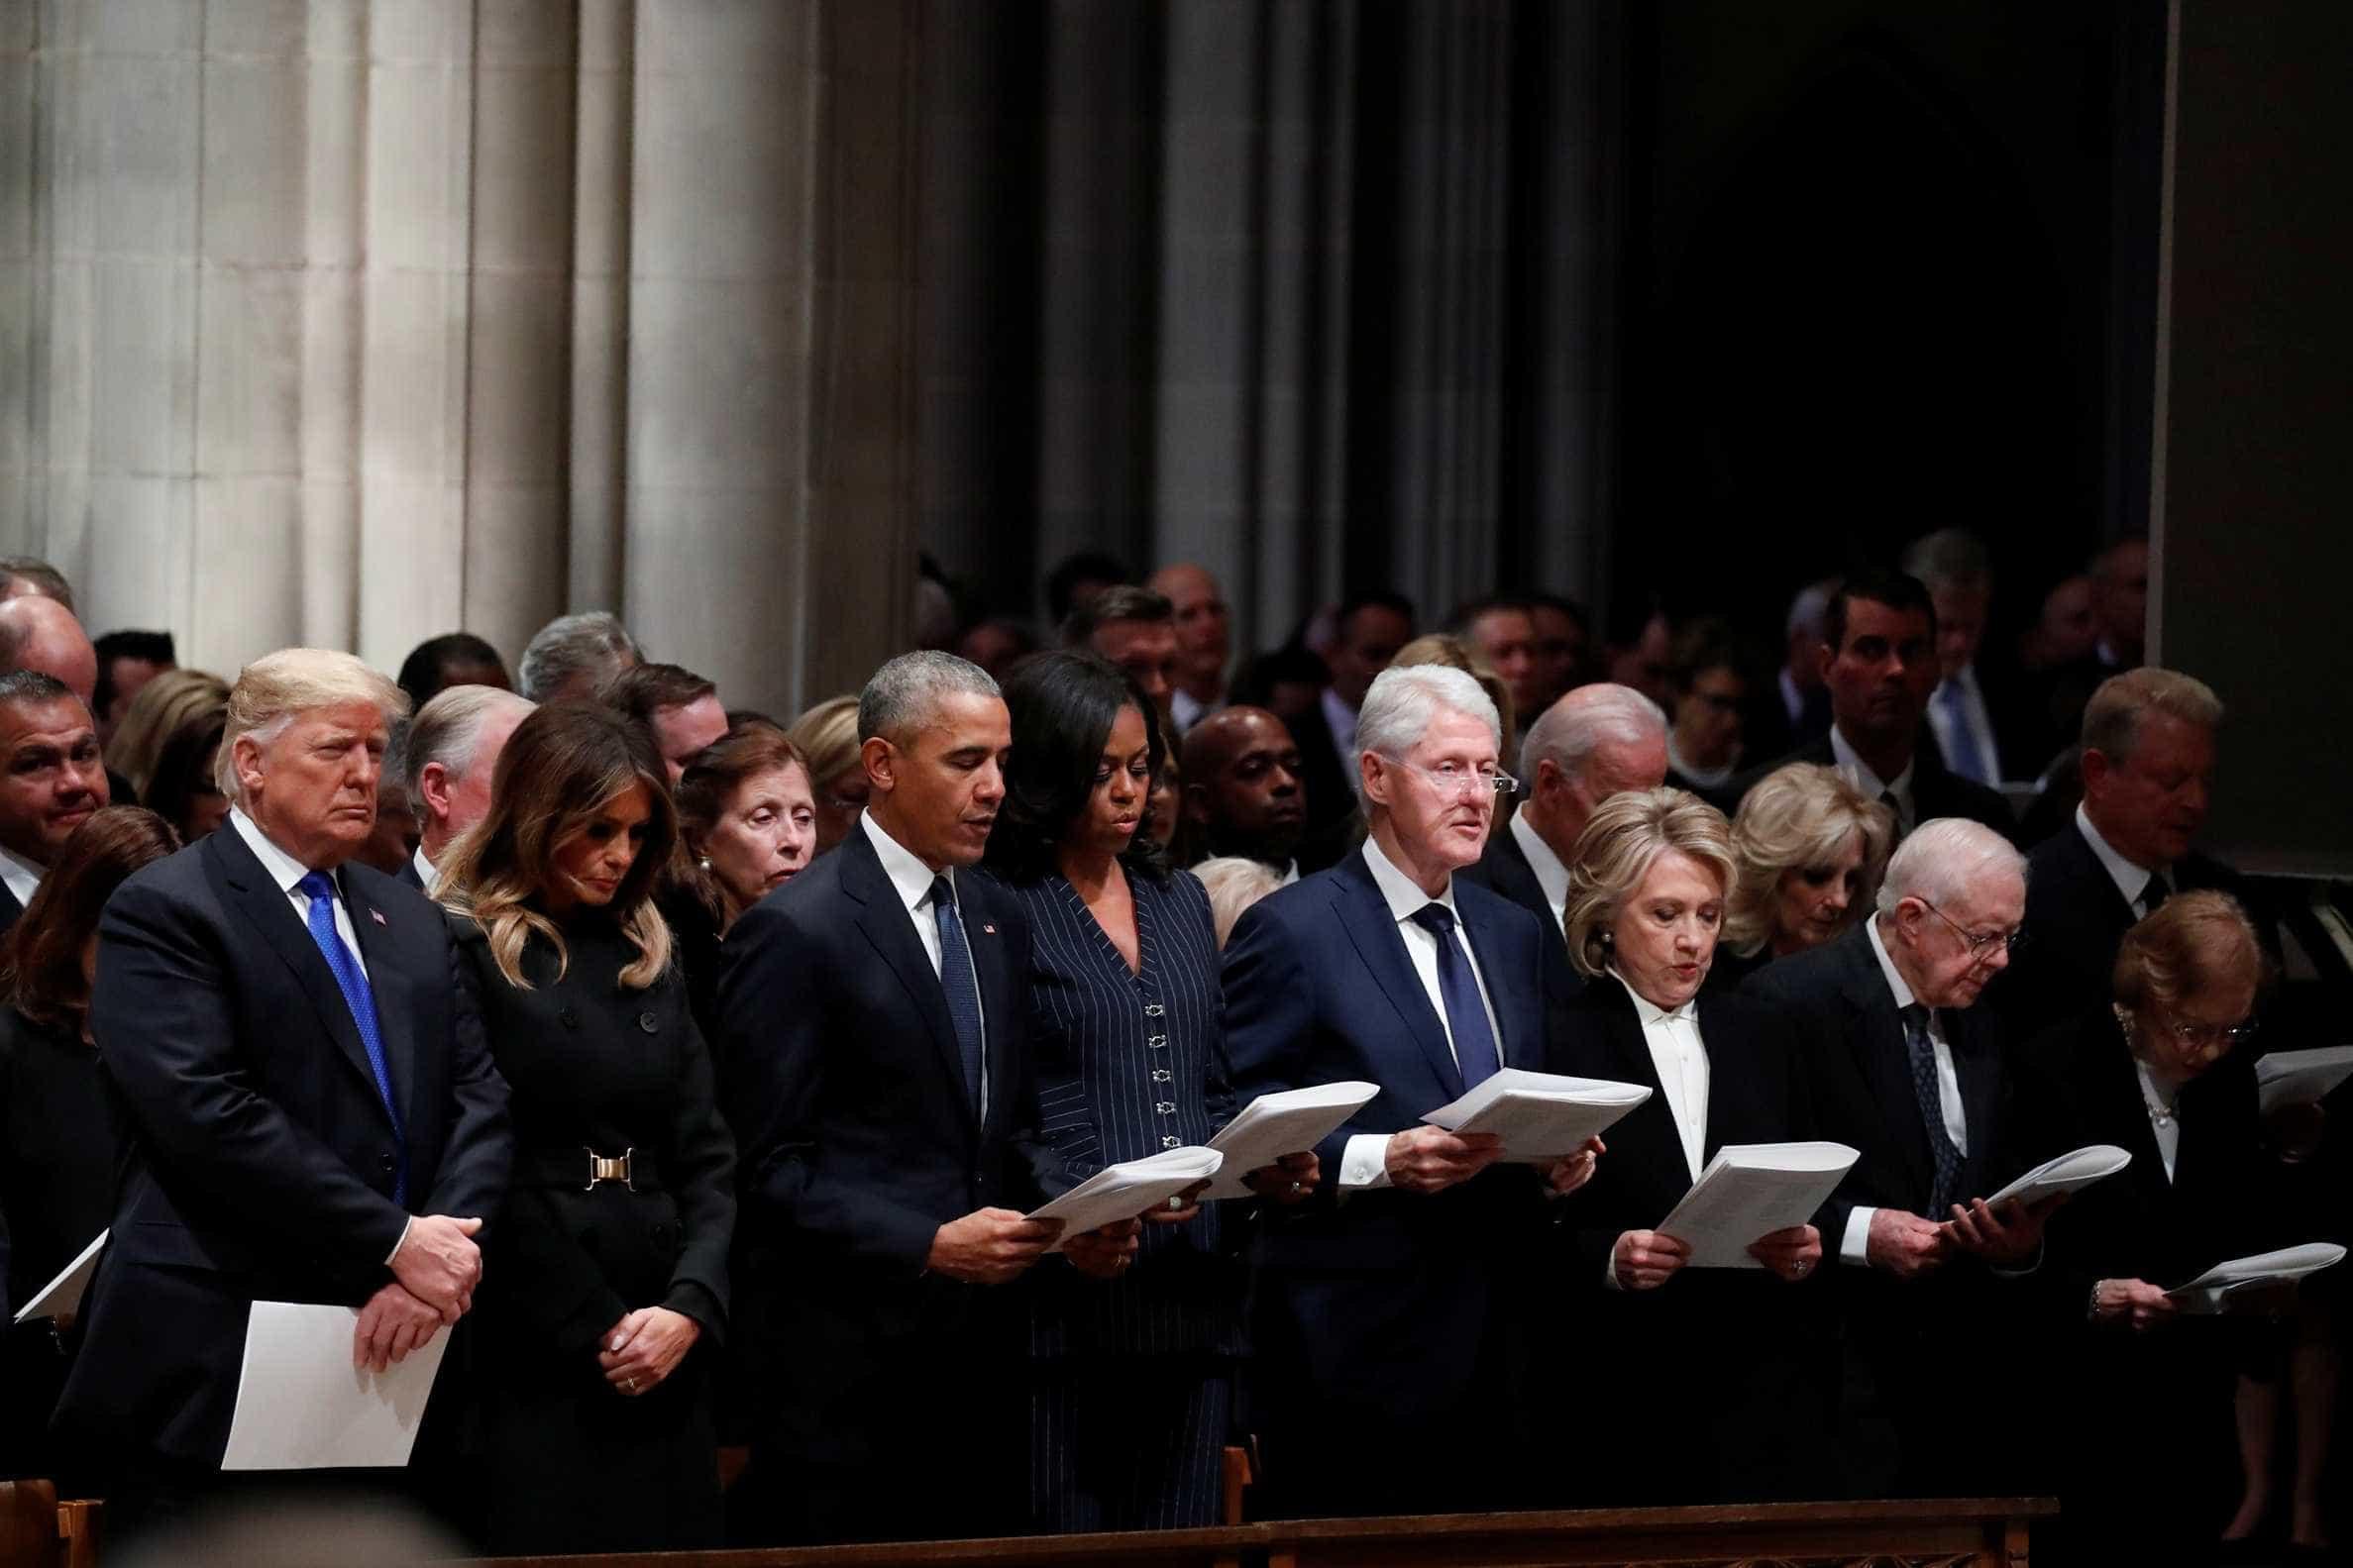 Trump cumprimenta Obama, mas ignora casal Clinton em funeral